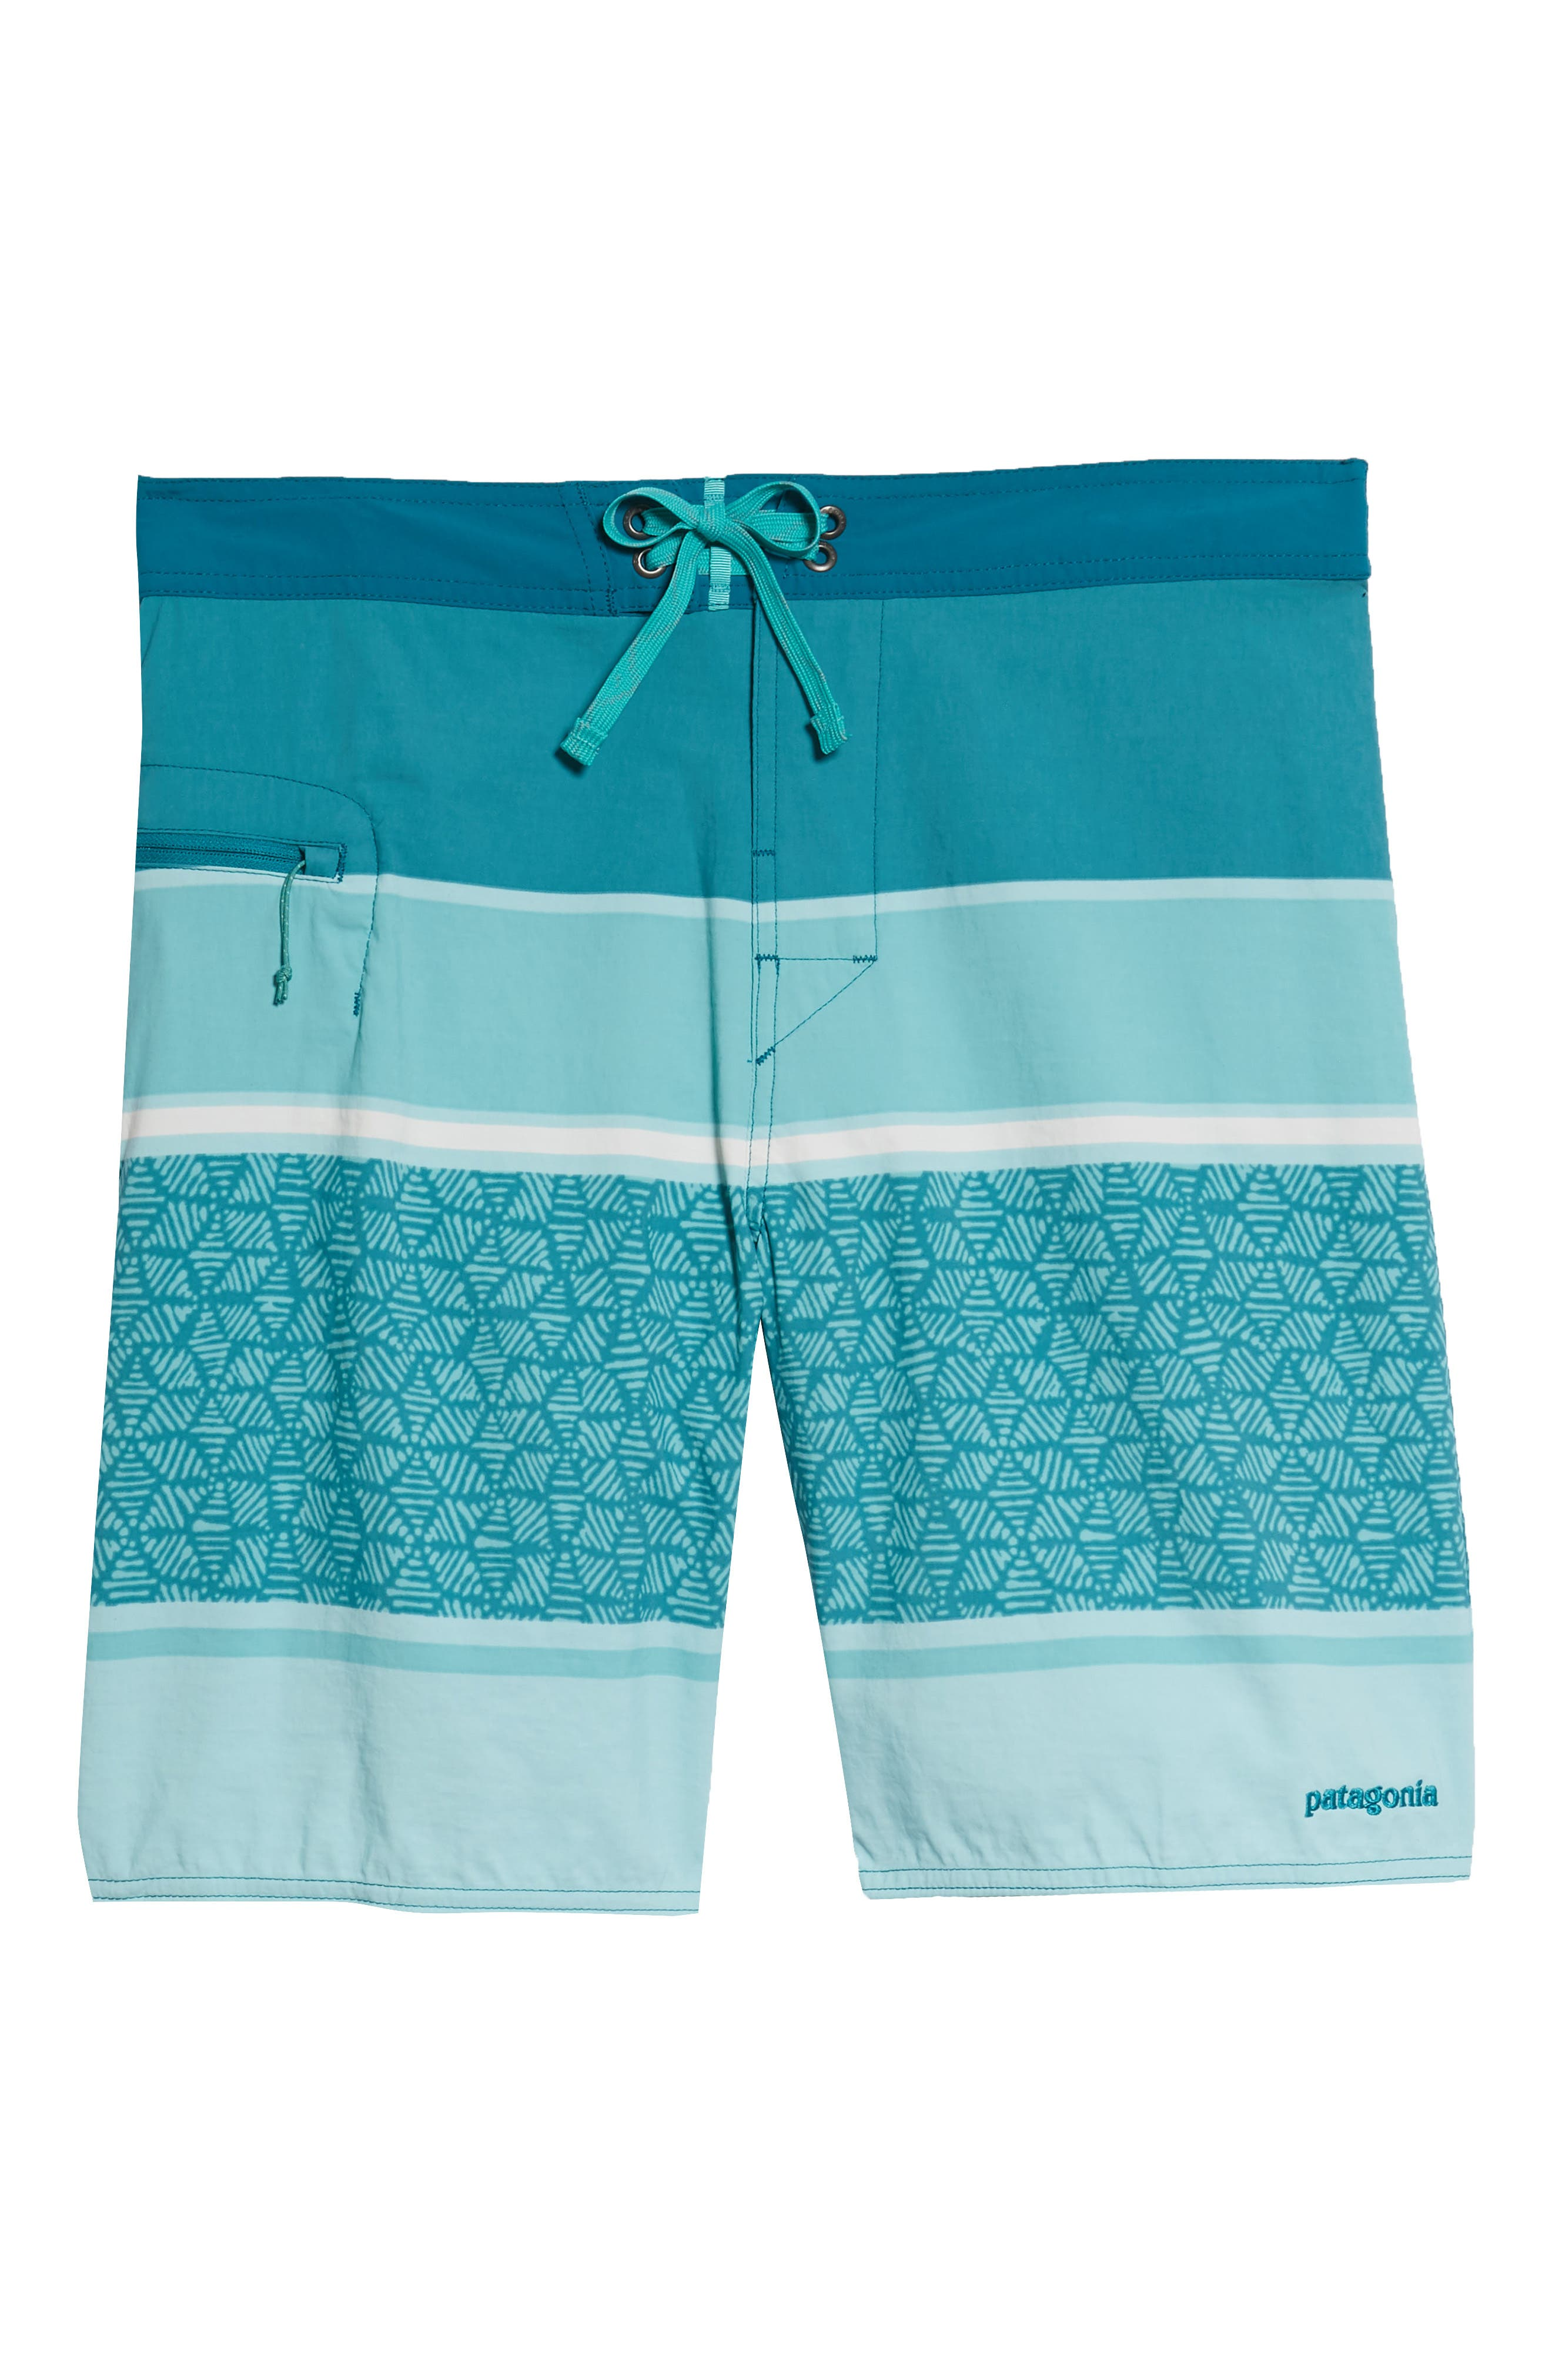 PATAGONIA,                             Wavefarer Board Shorts,                             Alternate thumbnail 6, color,                             404